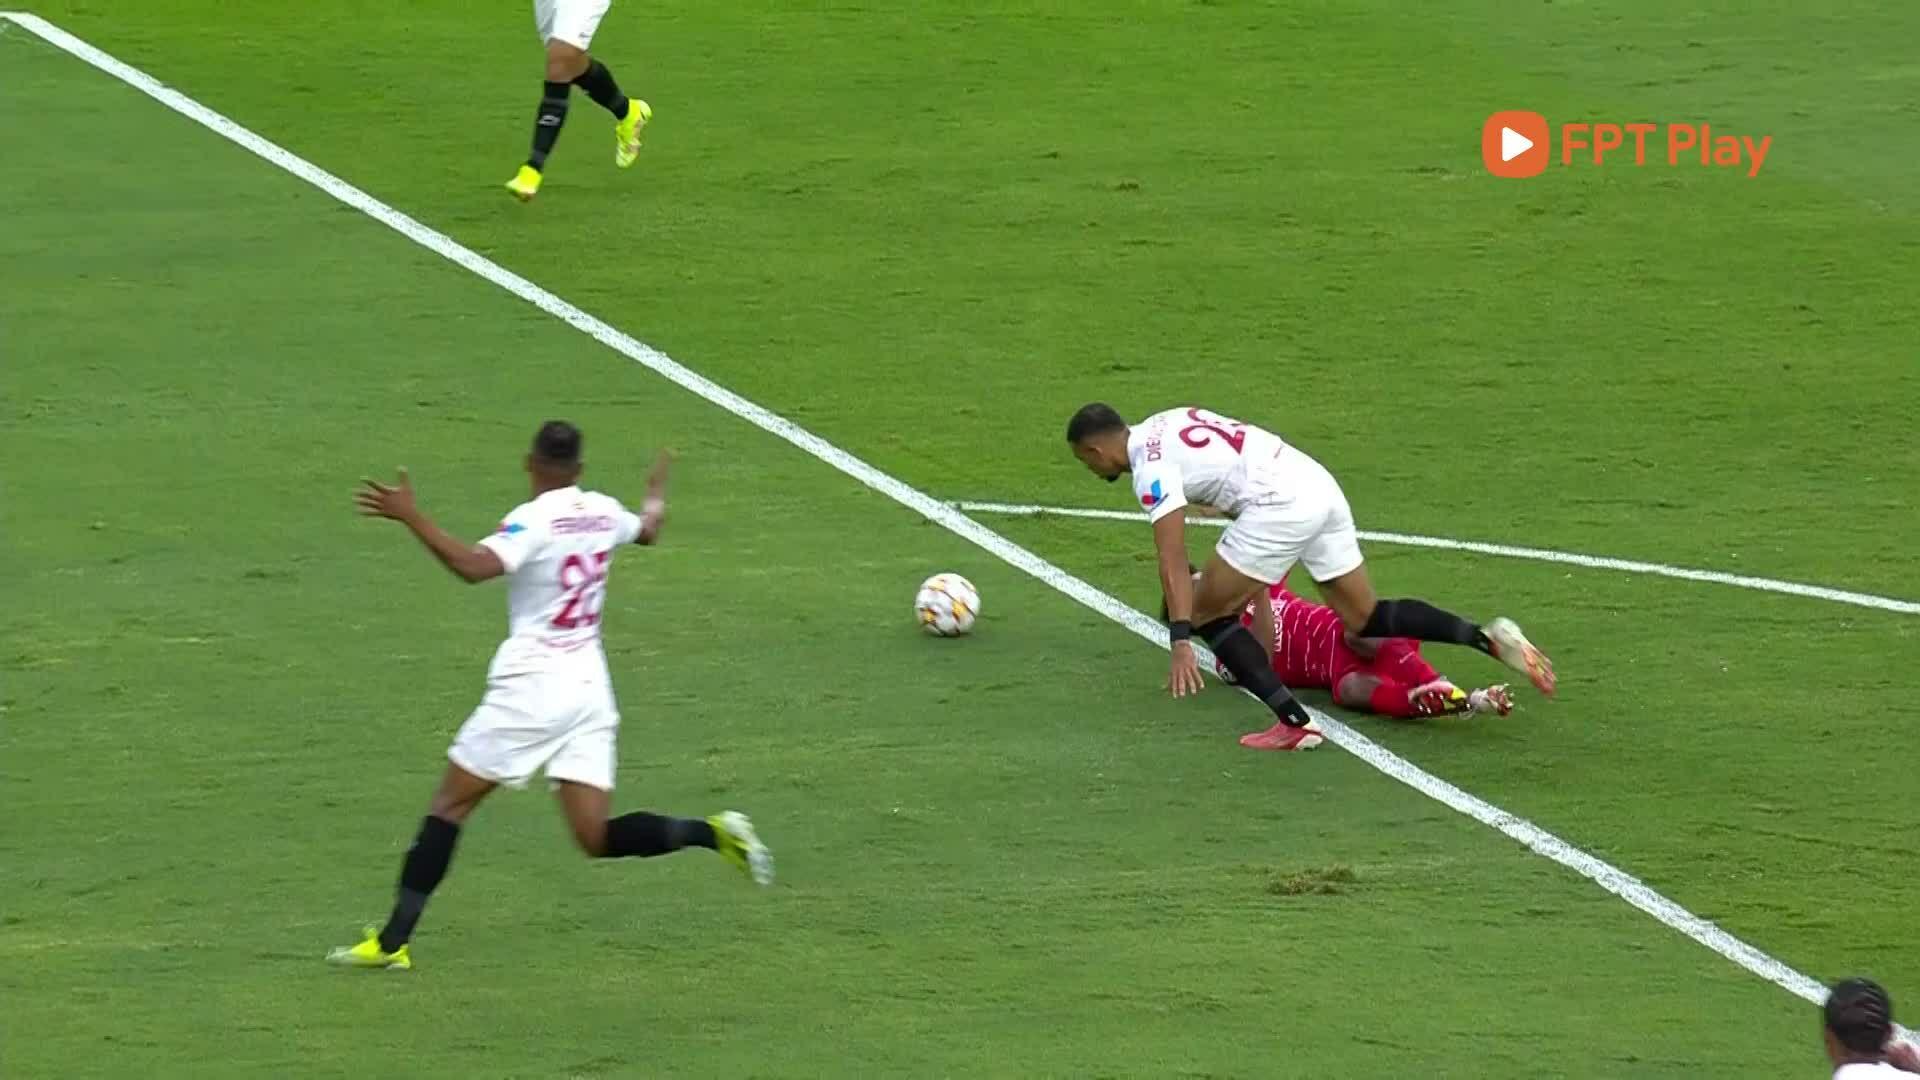 Sevilla 1-1 Salzburg